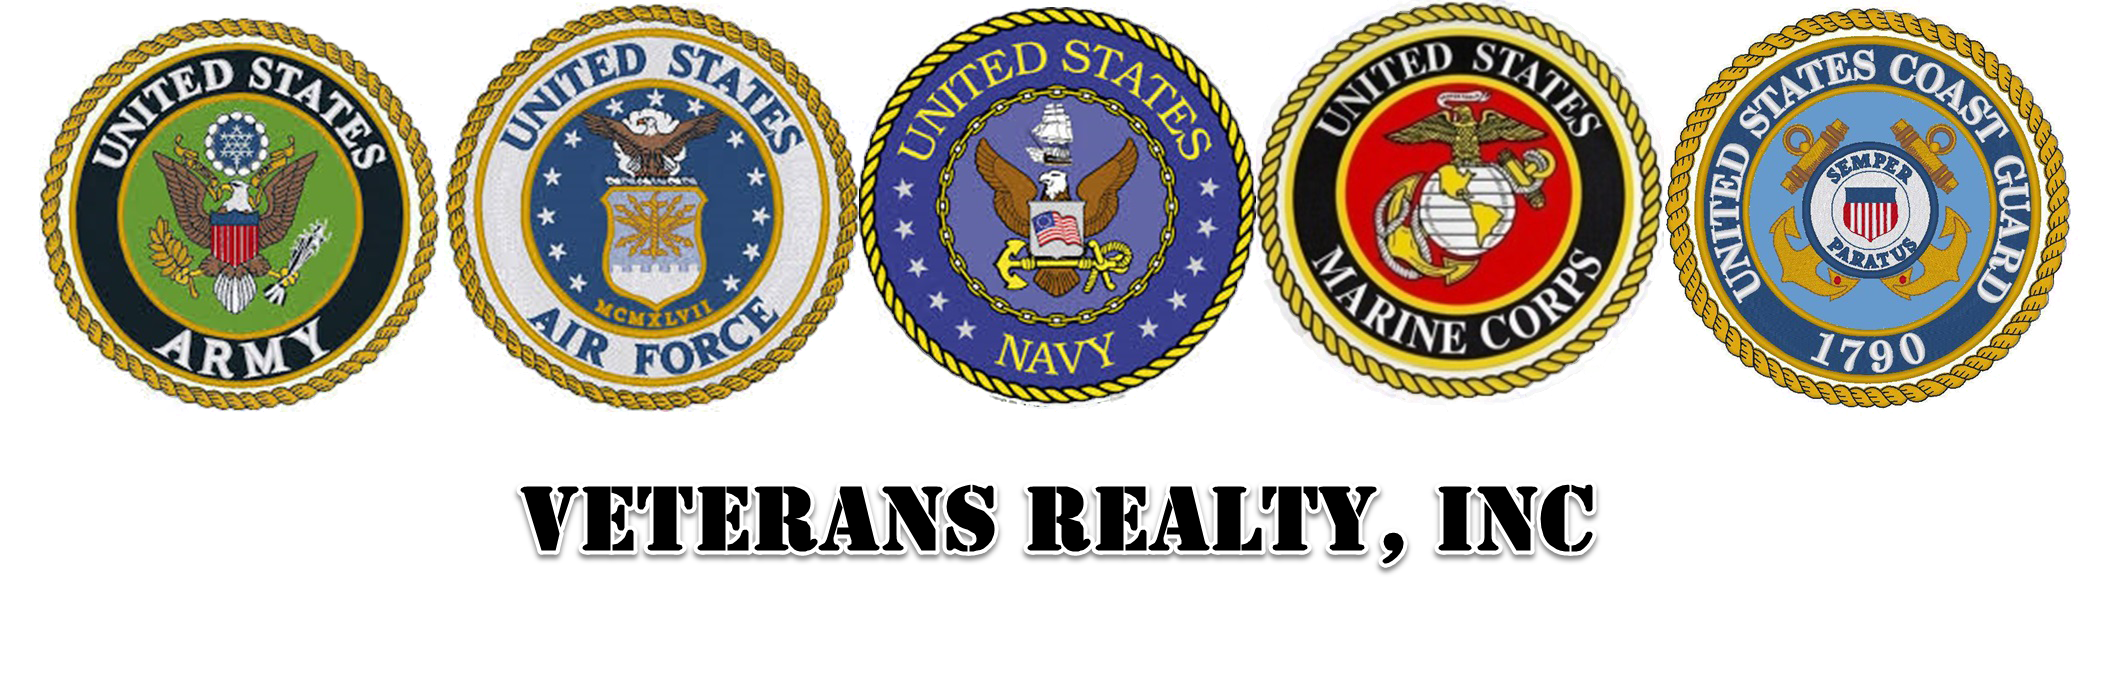 Veterans Realty Inc.